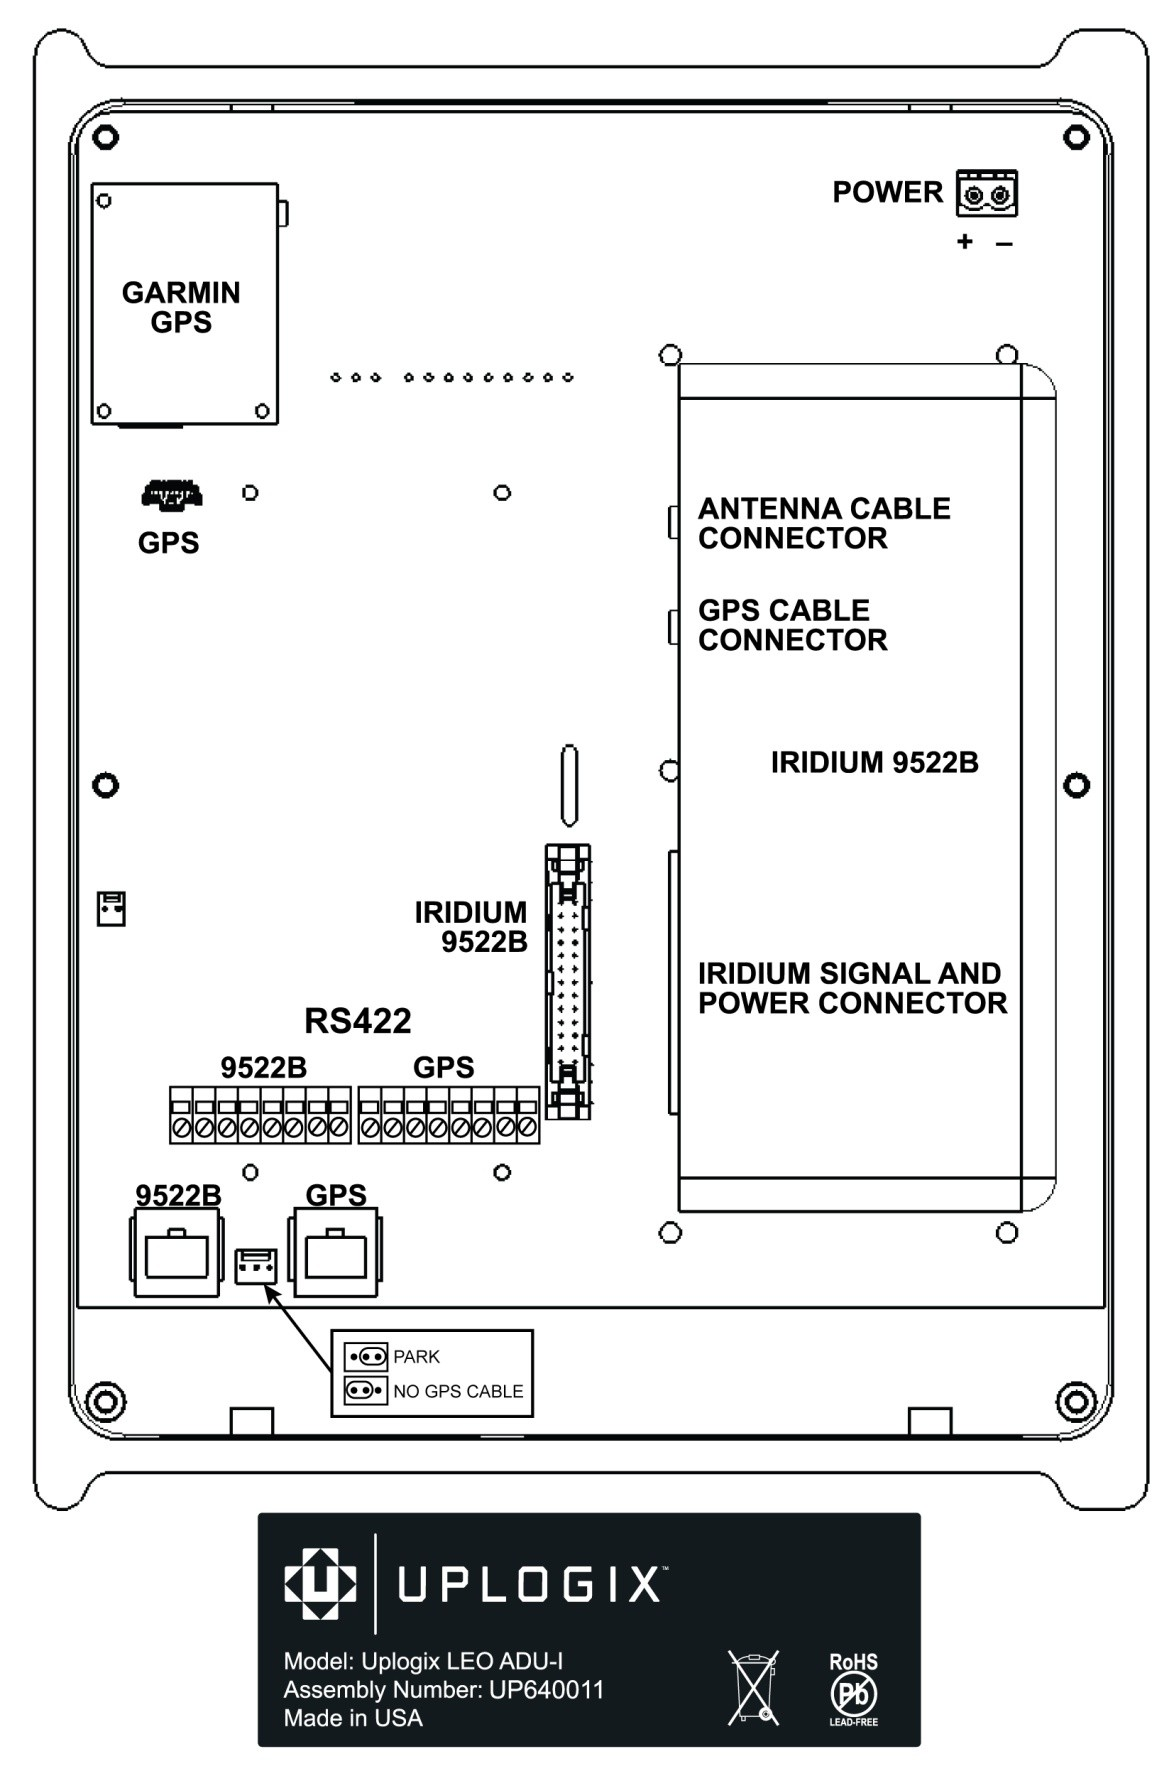 hight resolution of garmin transducer wiring diagram garmin transducer wiring diagram best gps antenna garmin gps of garmin transducer